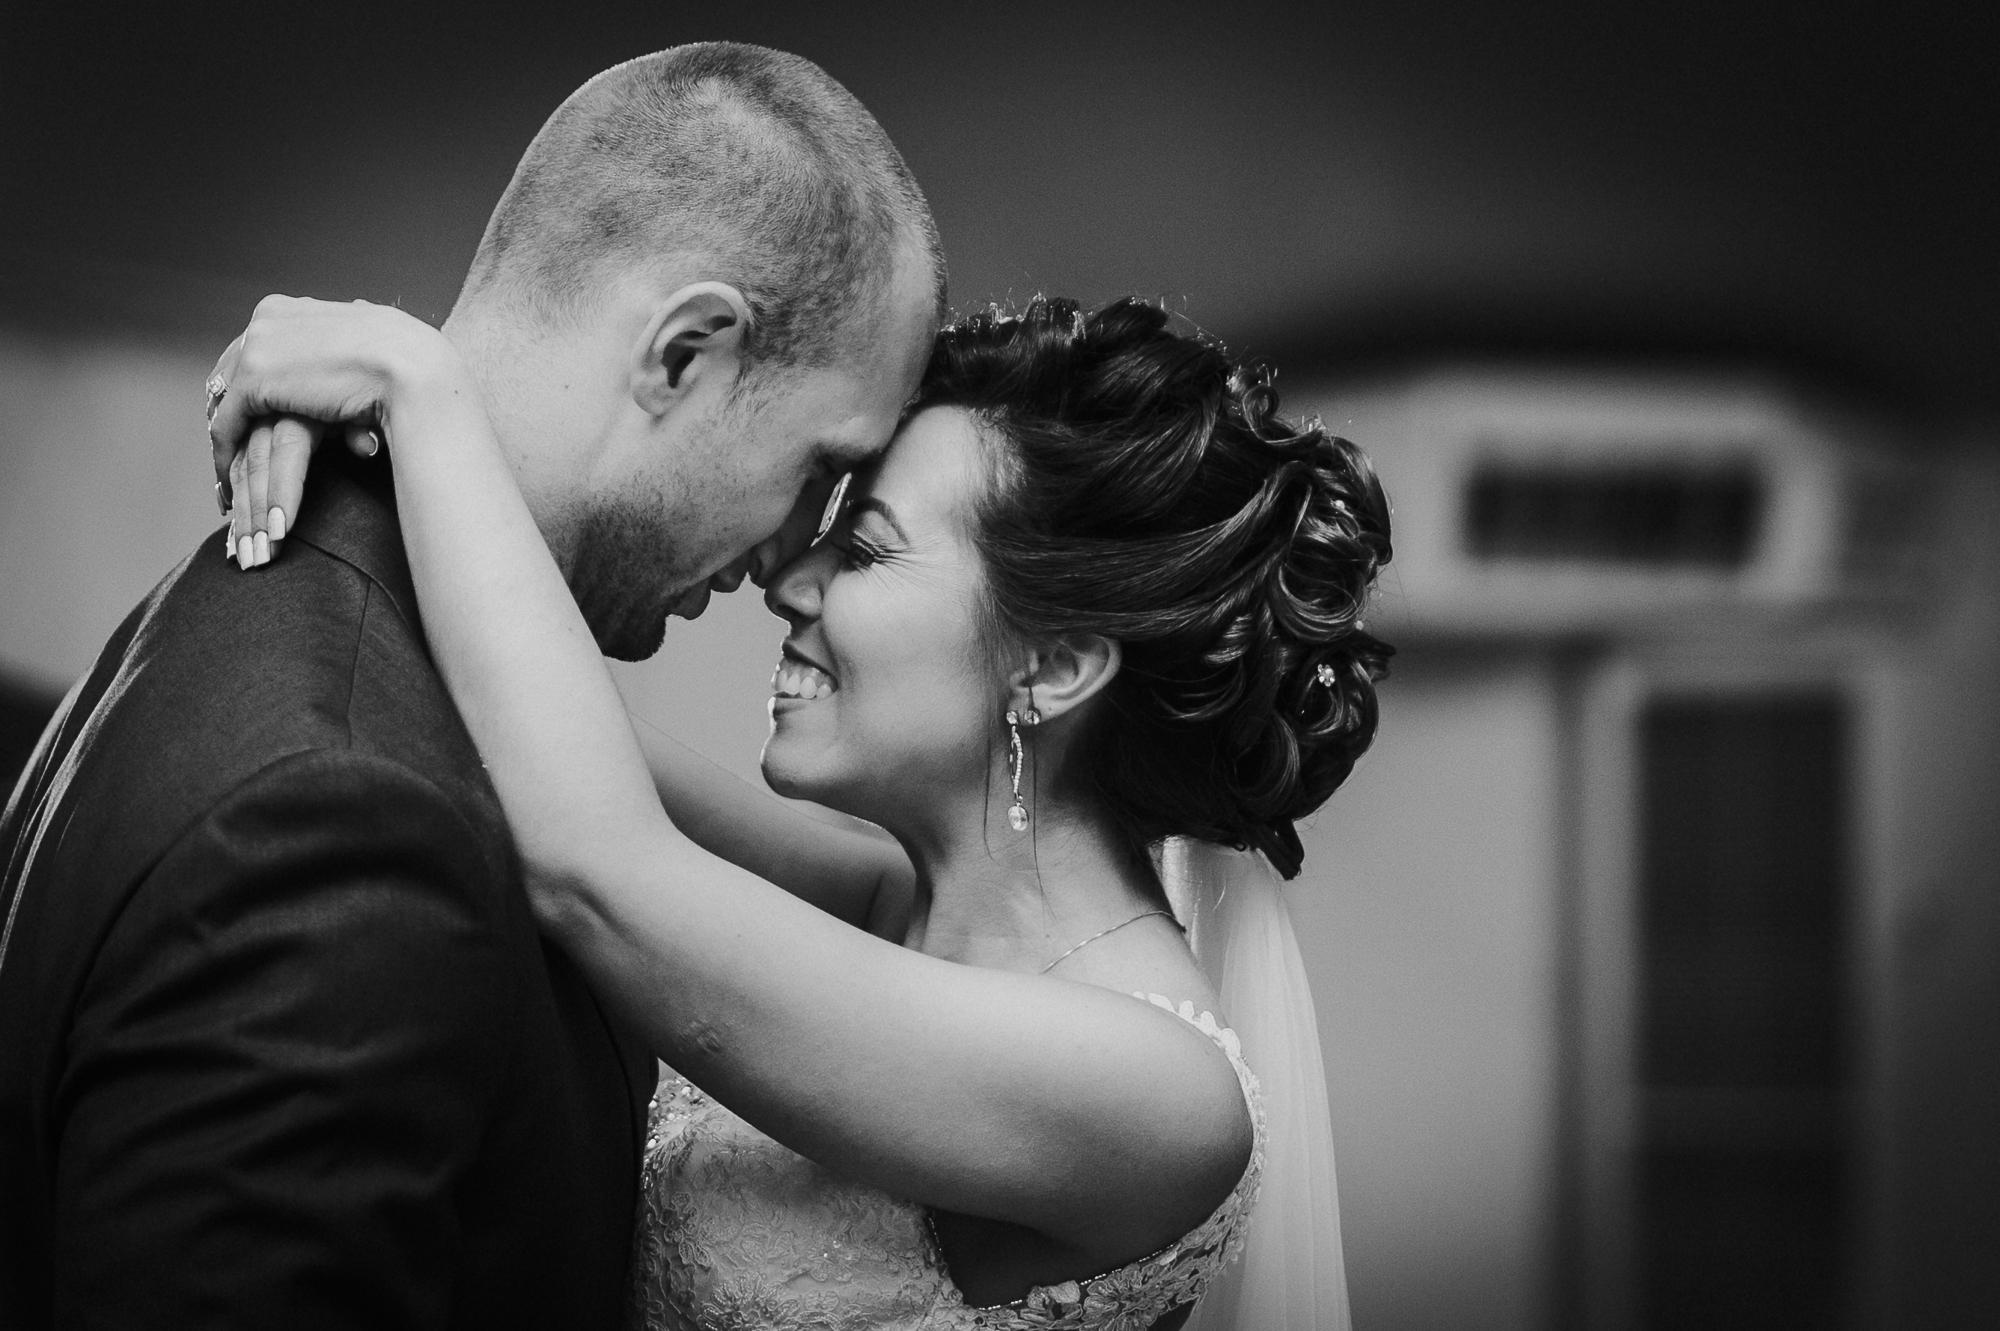 Christina-and-Gene-Wedding-Marla-Rain-Photography-484.jpg